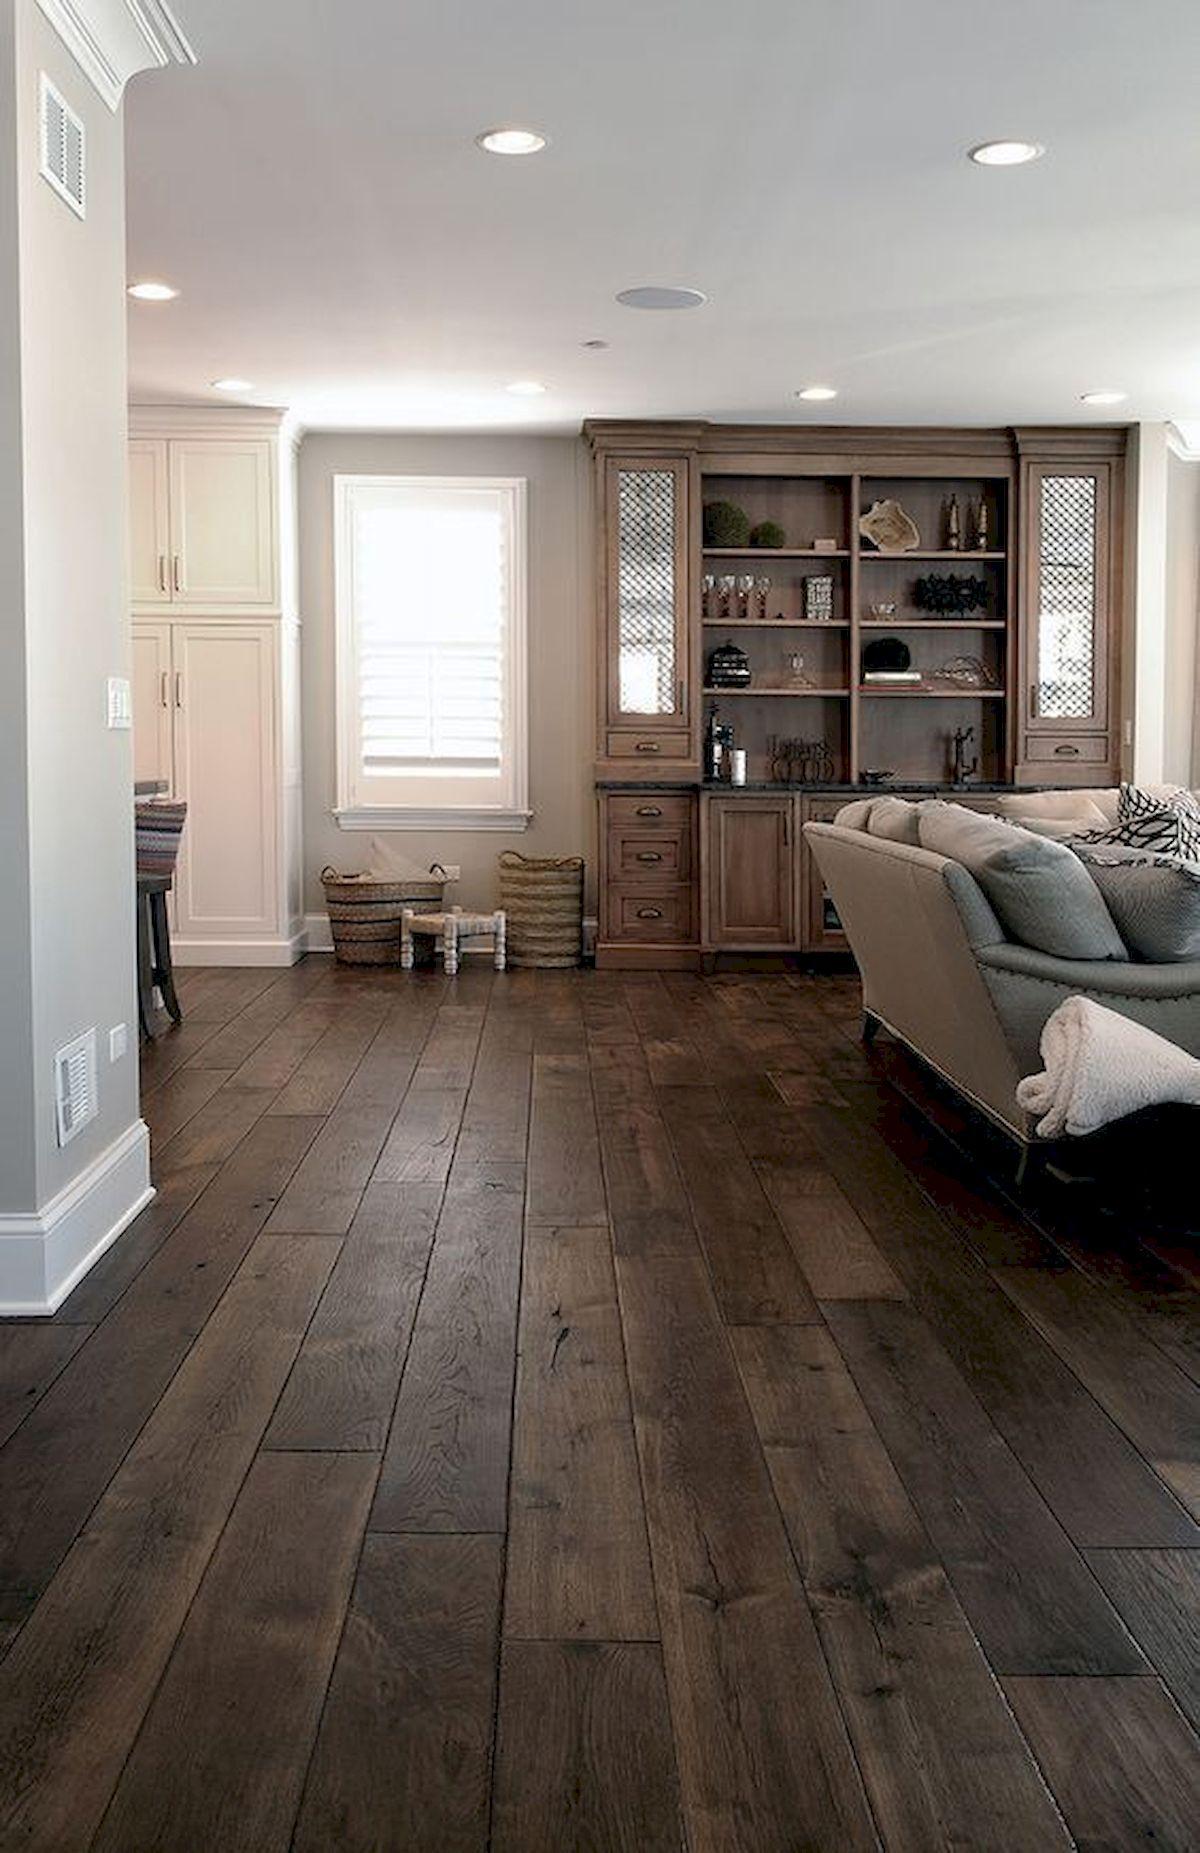 80 Gorgeous Hardwood Floor Ideas for Interior Home (10)